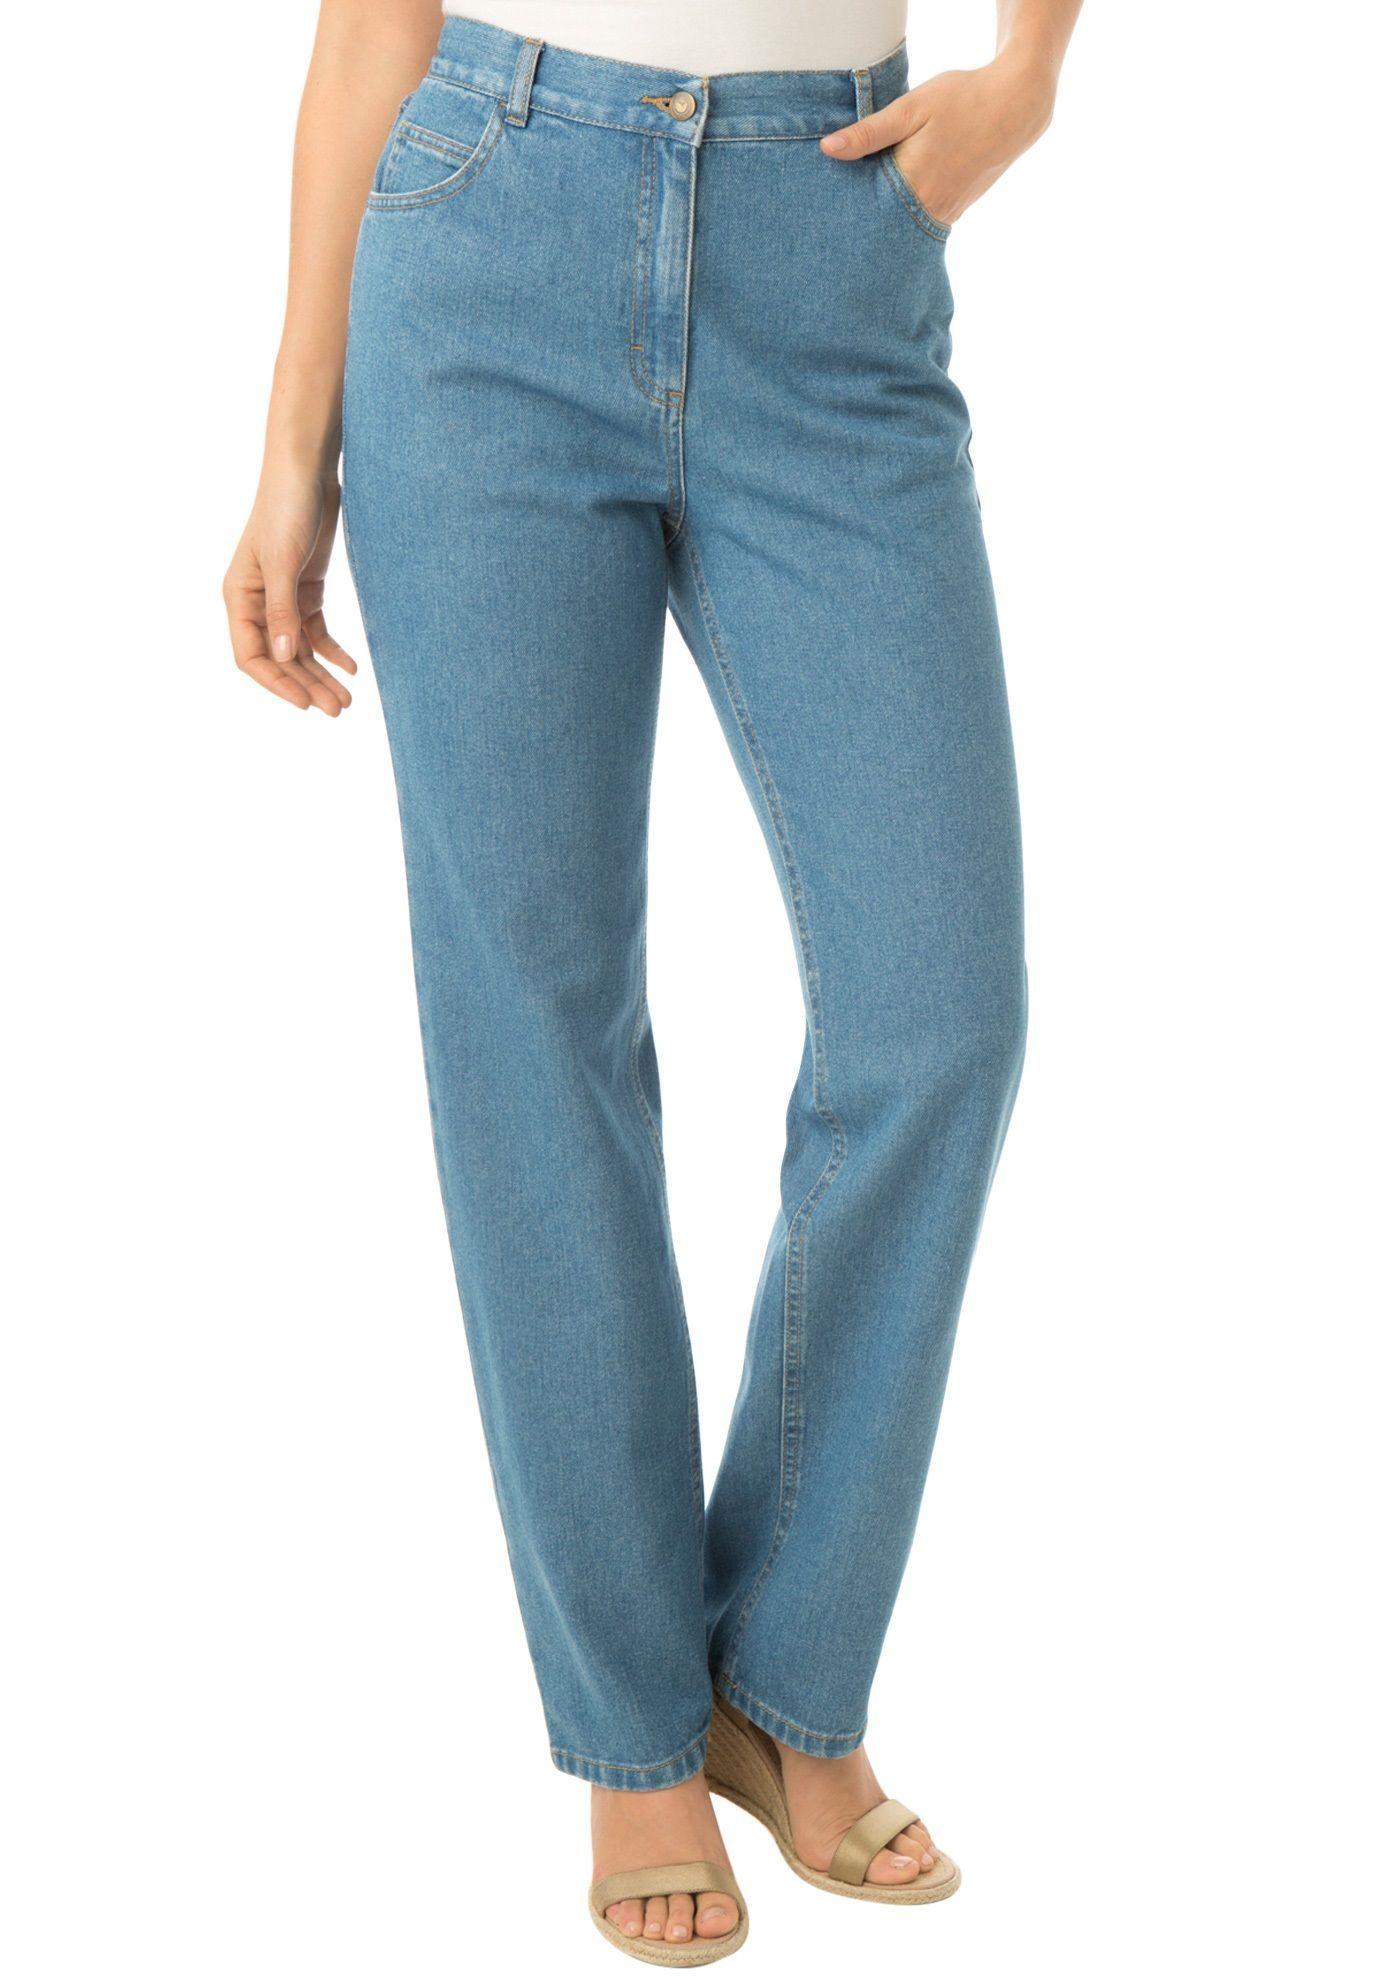 8c30e864f590d Stretch Back-Elastic Straight-Leg Jeans - Women s Plus Size Clothing ...